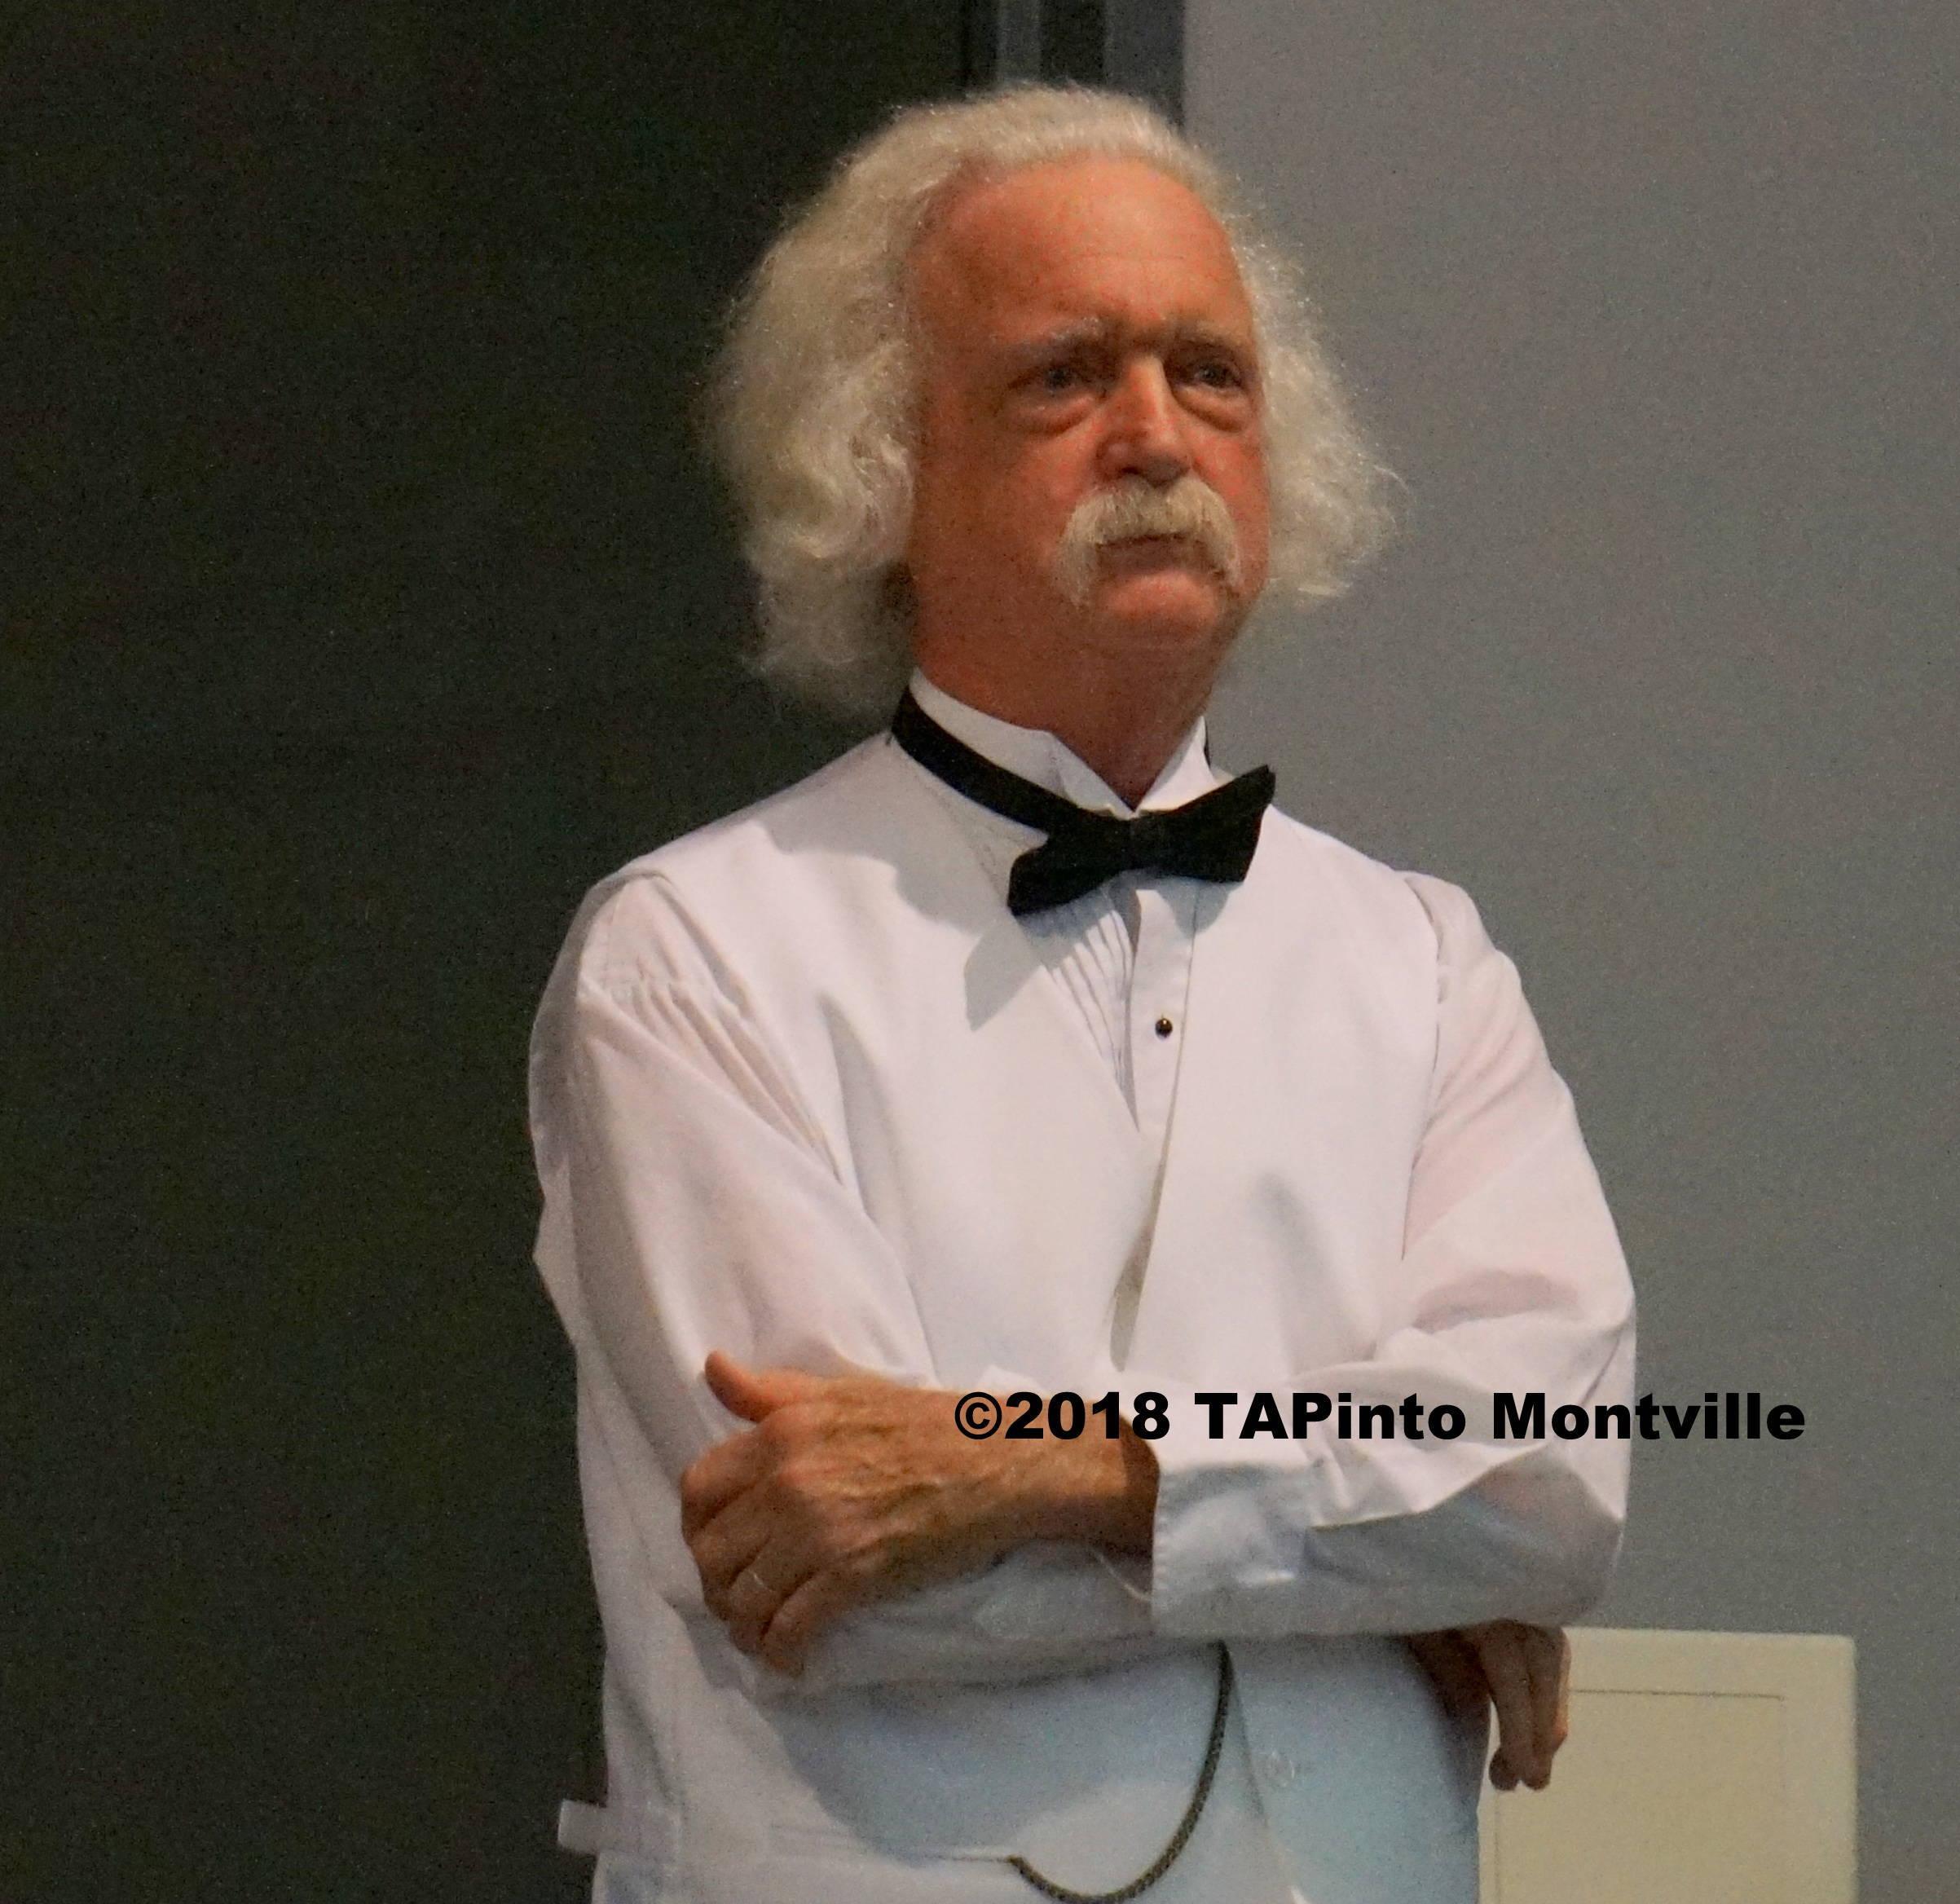 e907d1d00966c5fc0450_a_Mark_Twain_re-enactor_Charles_Kiernan_of_the_Lehigh_Valley_Storytelling_Guild__2018_TAPInto_Montville____1..JPG